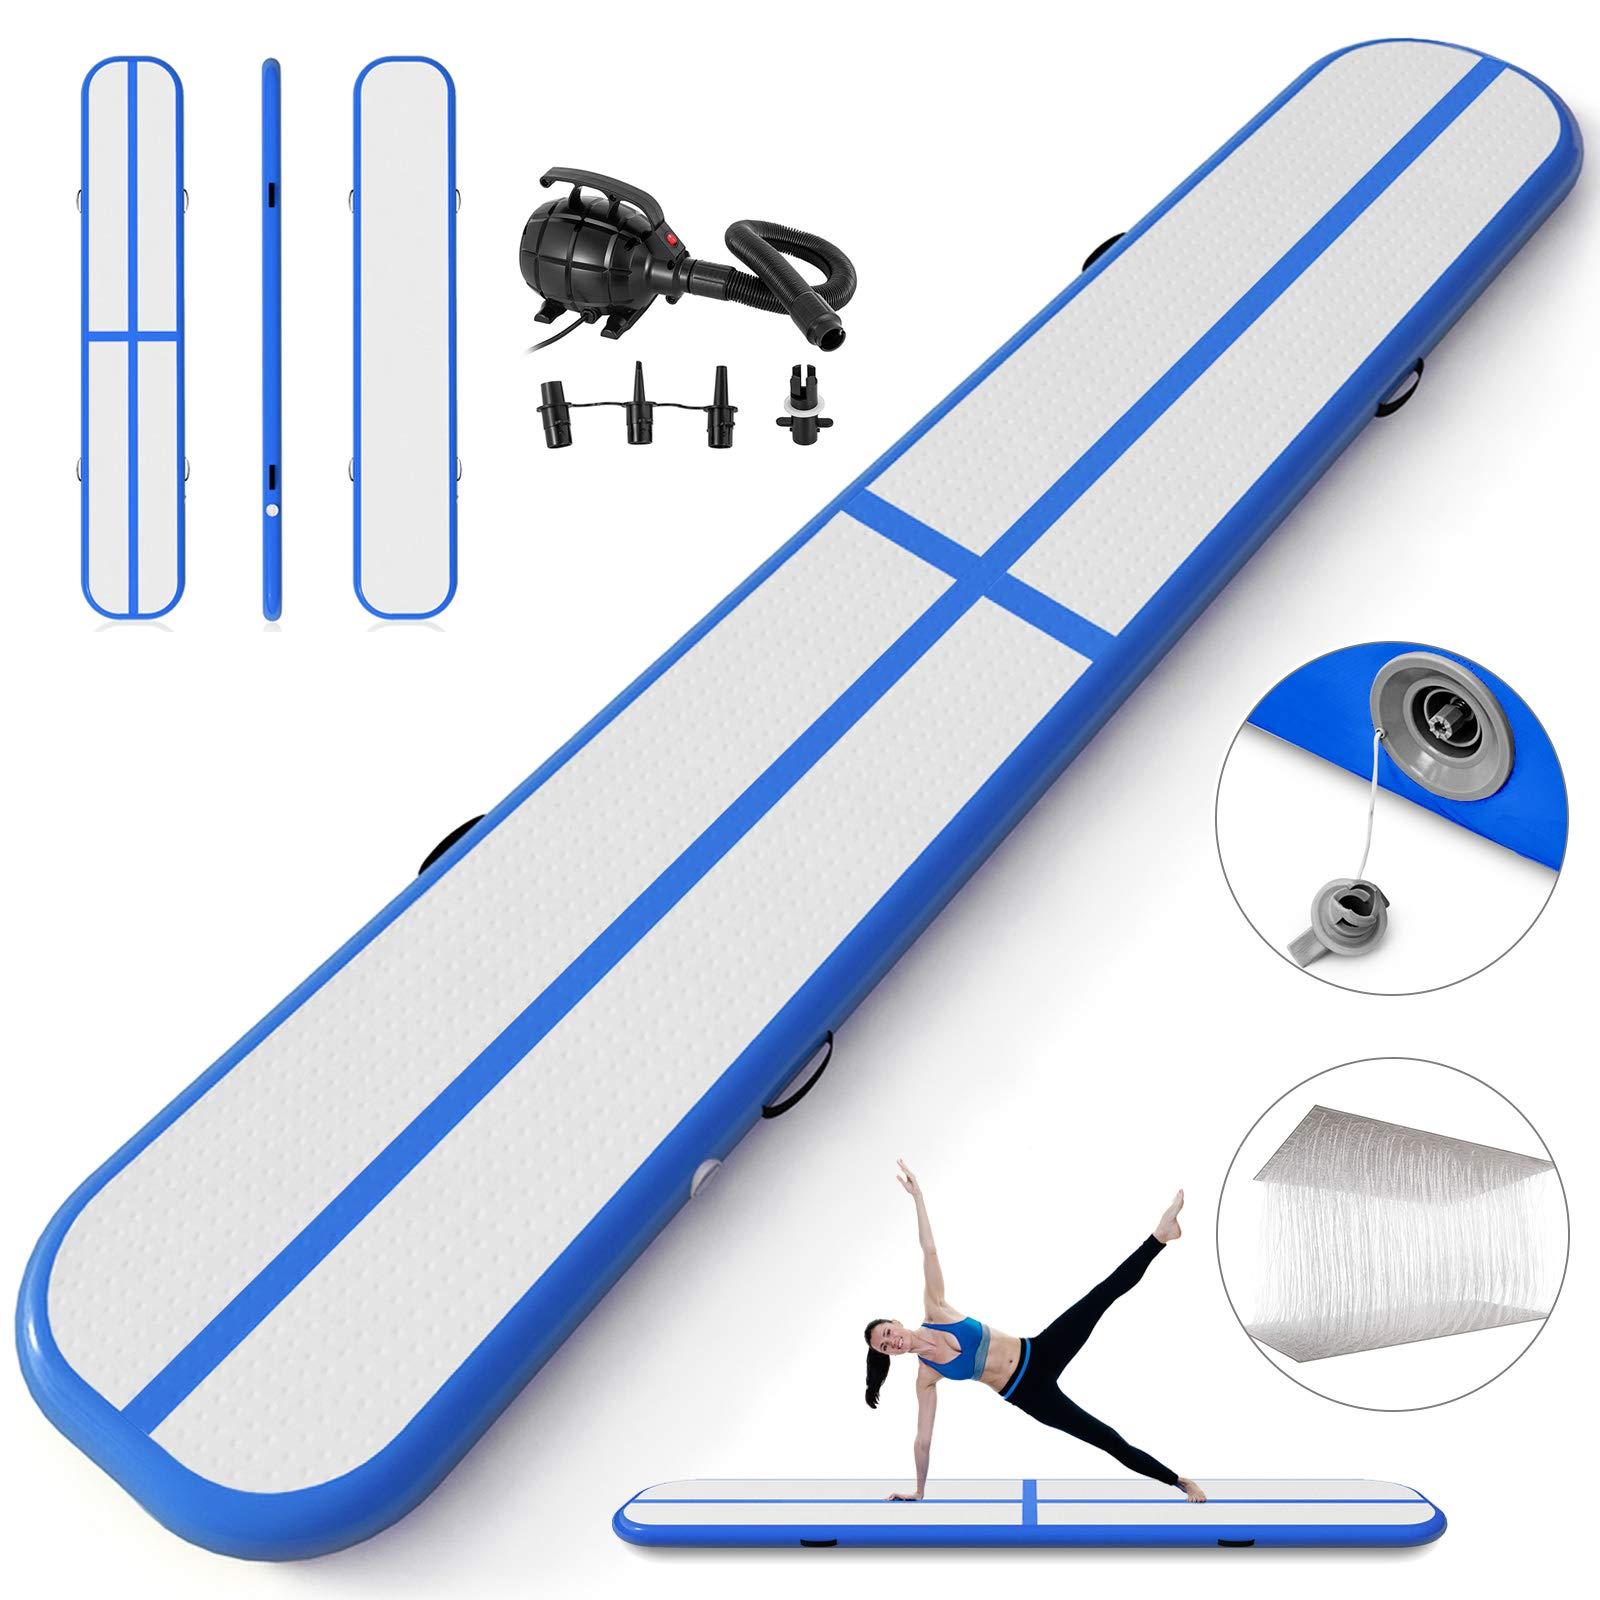 Happybuy Inflatable Gymnastics Tumbling Mat Air Tumbling Track Air Floor Mat for Home Use/Cheerleading/Beach/Park (Blue, 5X0.4X0.1M)